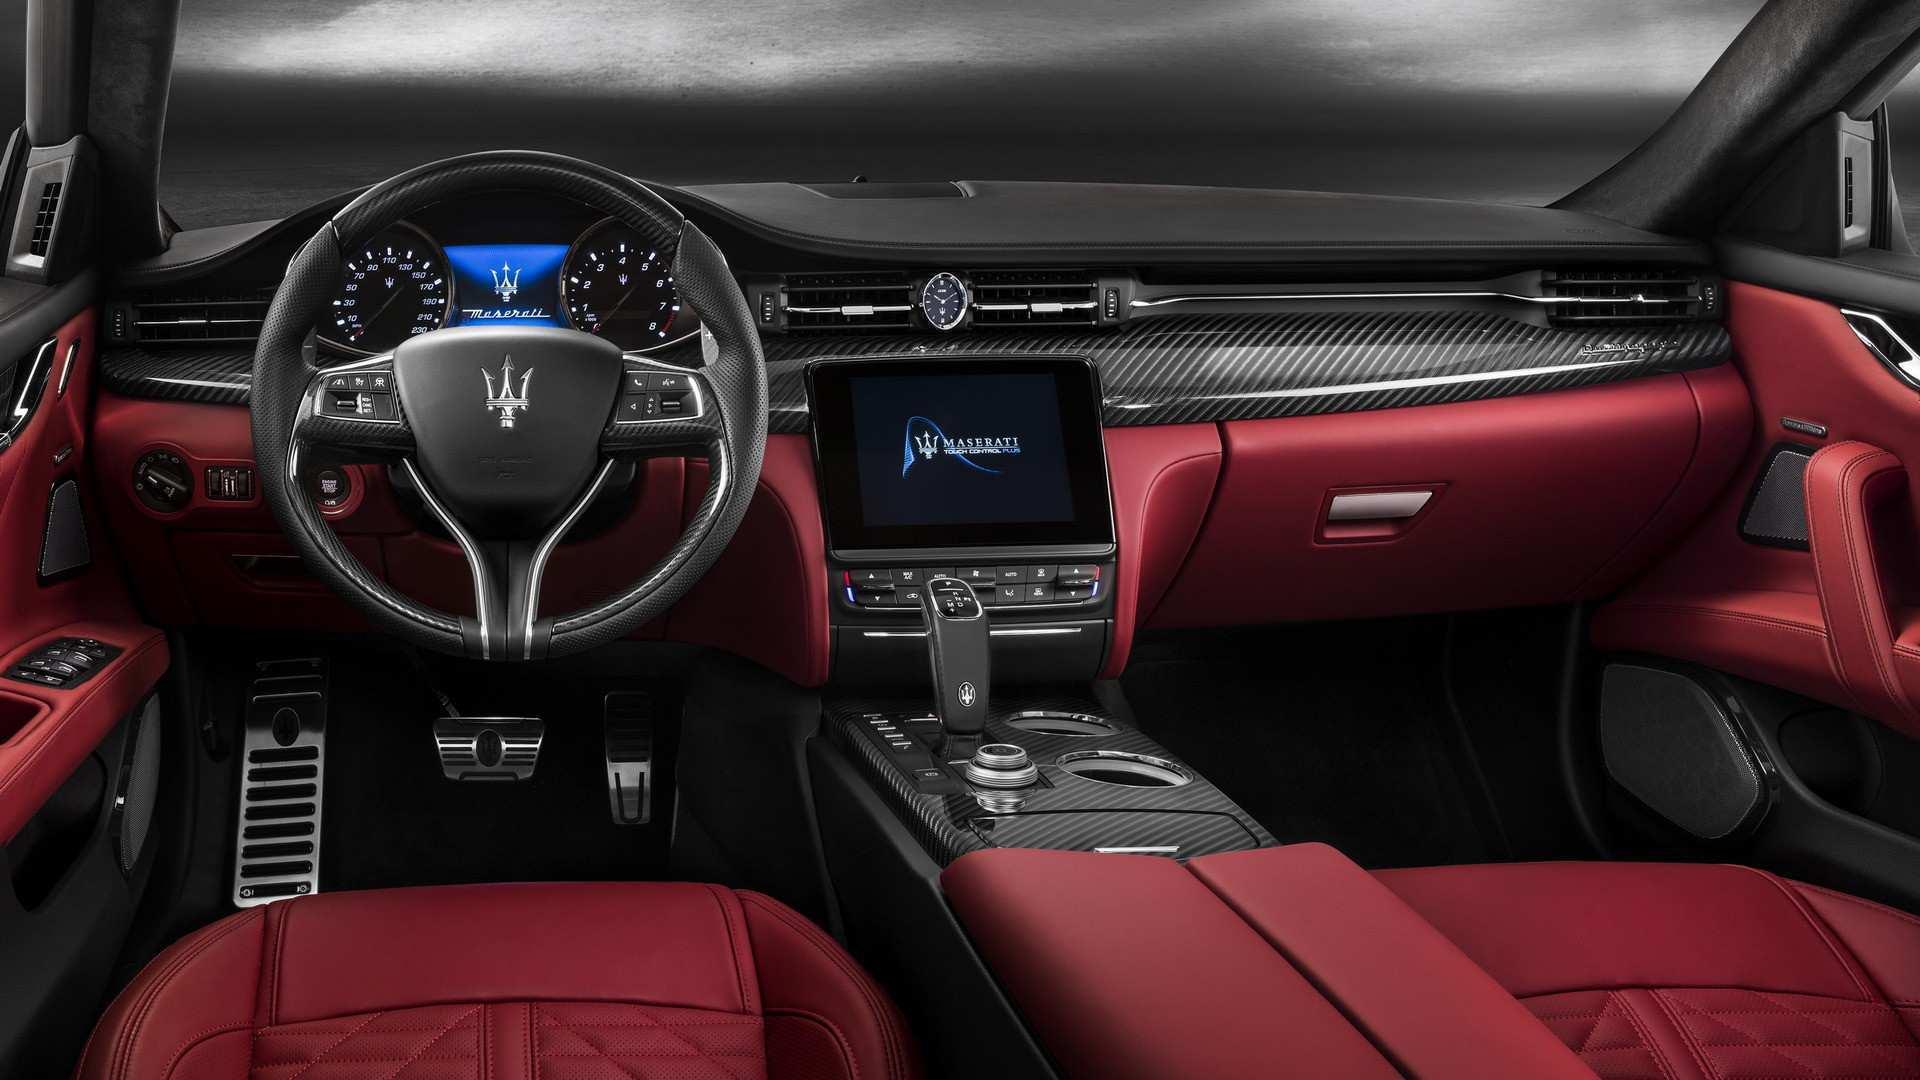 99 Great Maserati Quattroporte Gts 2019 Model by Maserati Quattroporte Gts 2019